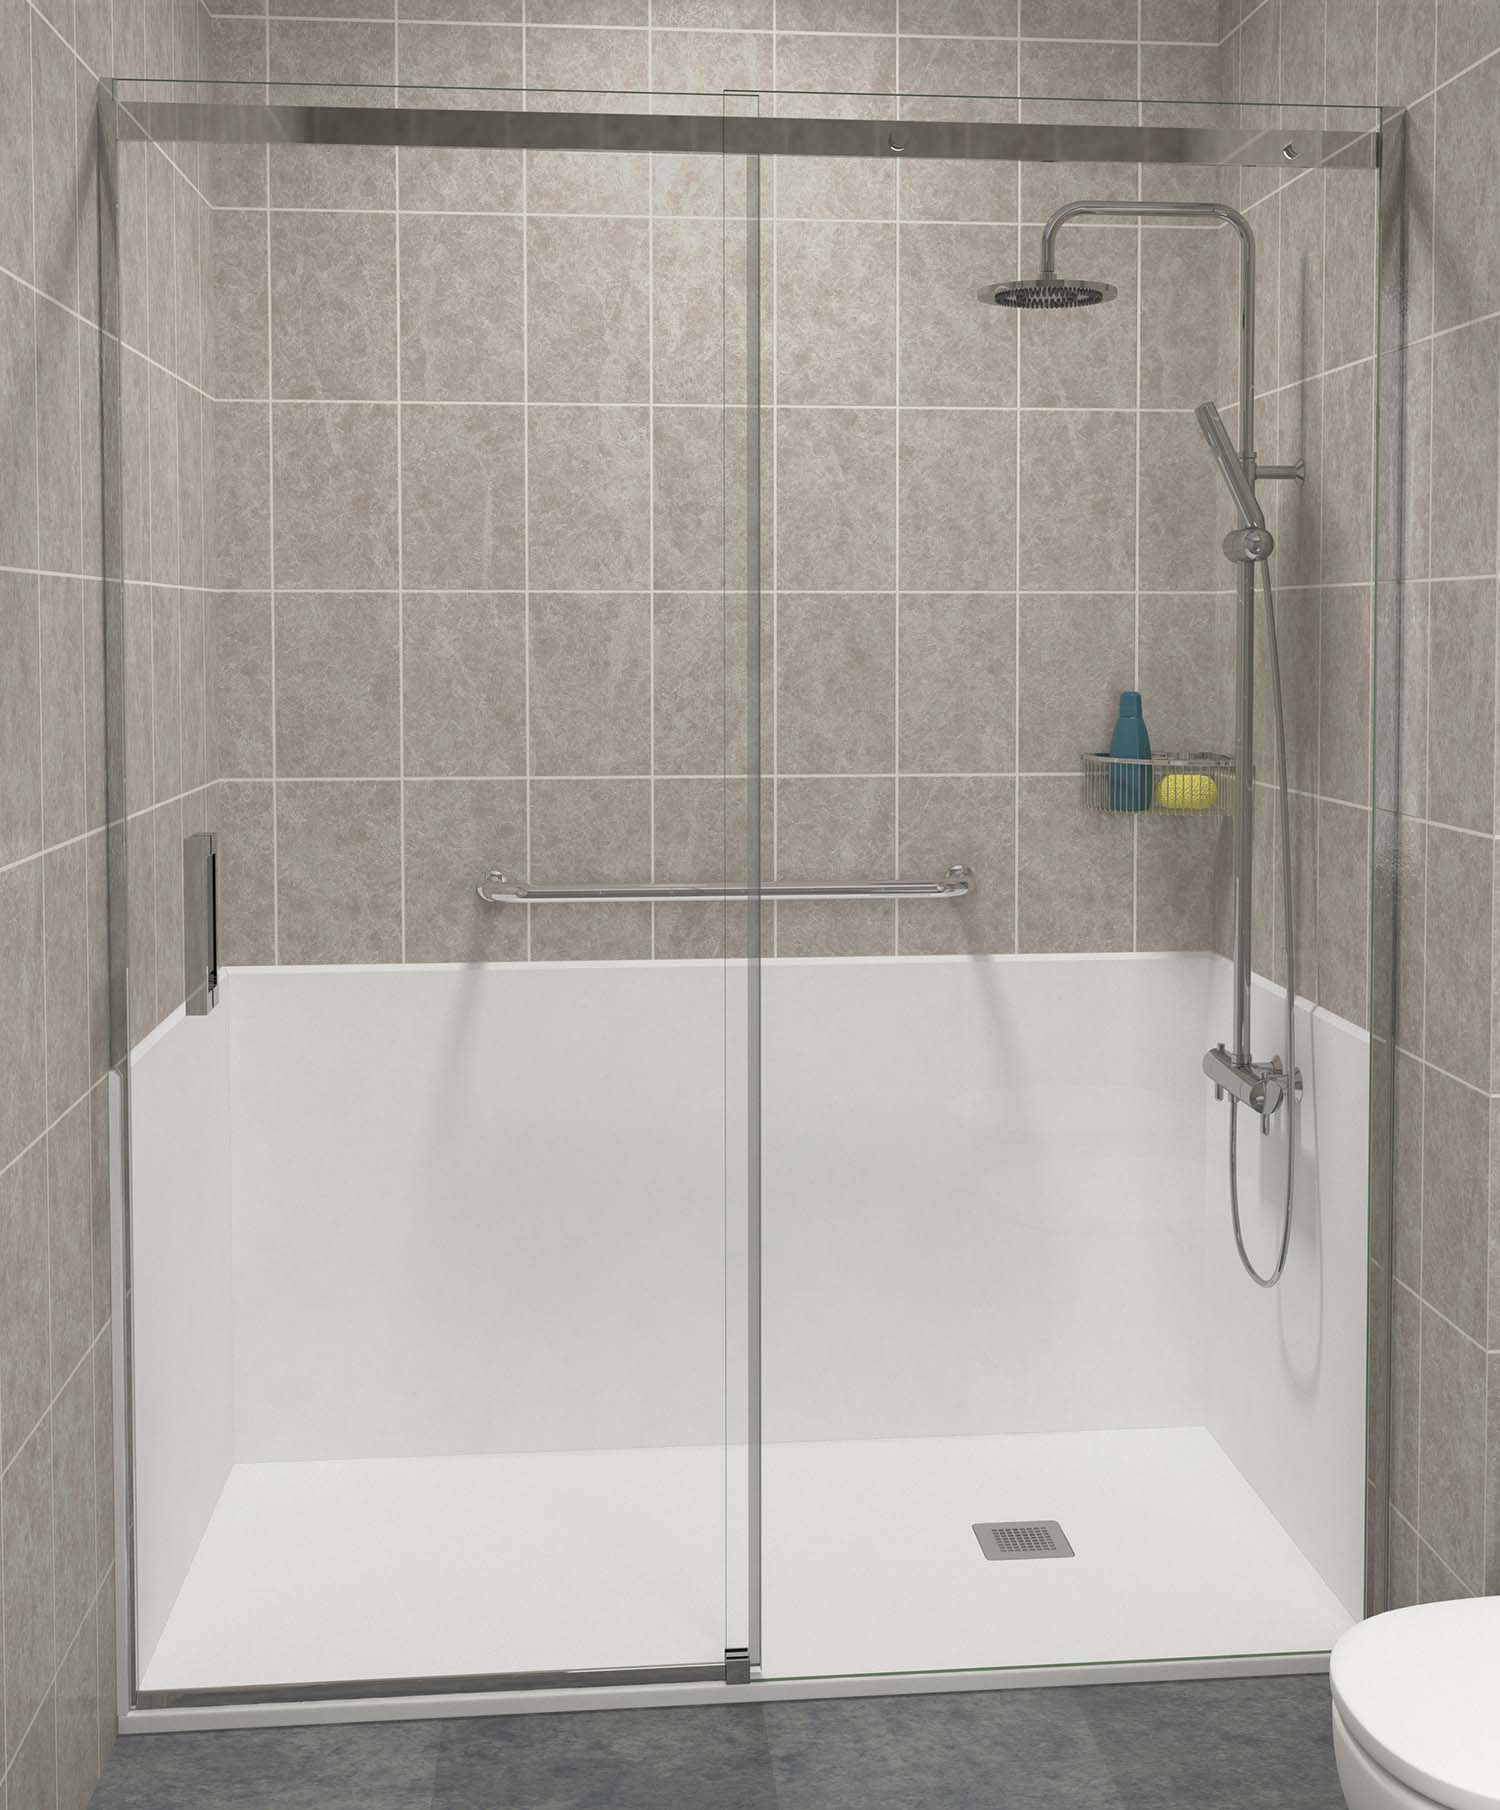 Cambiar de ba era a ducha duchaya for Cambiar banera por ducha